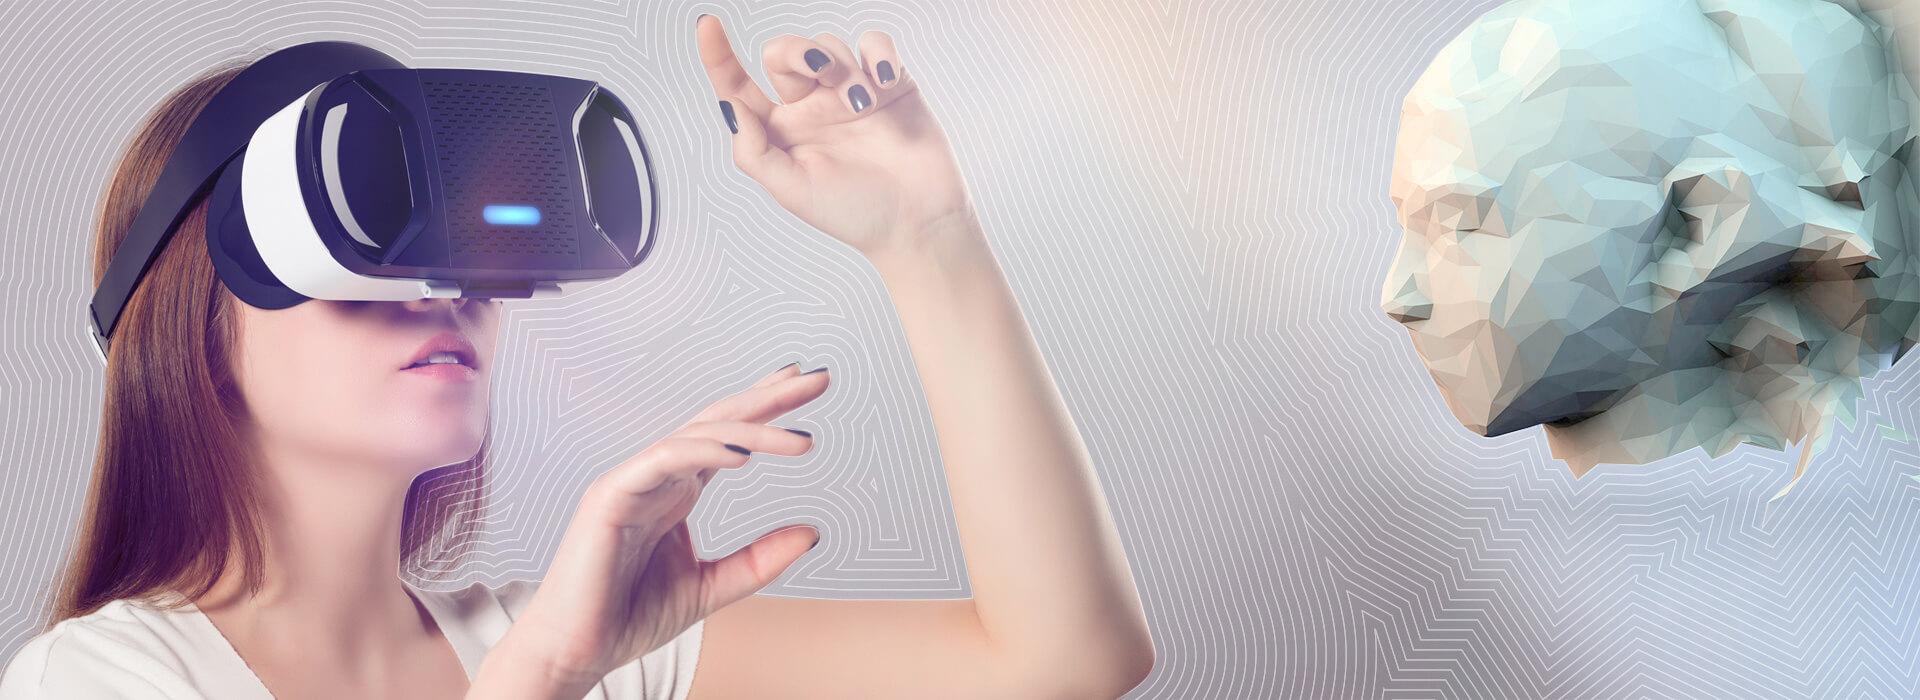 inmersys-realidad-virtual